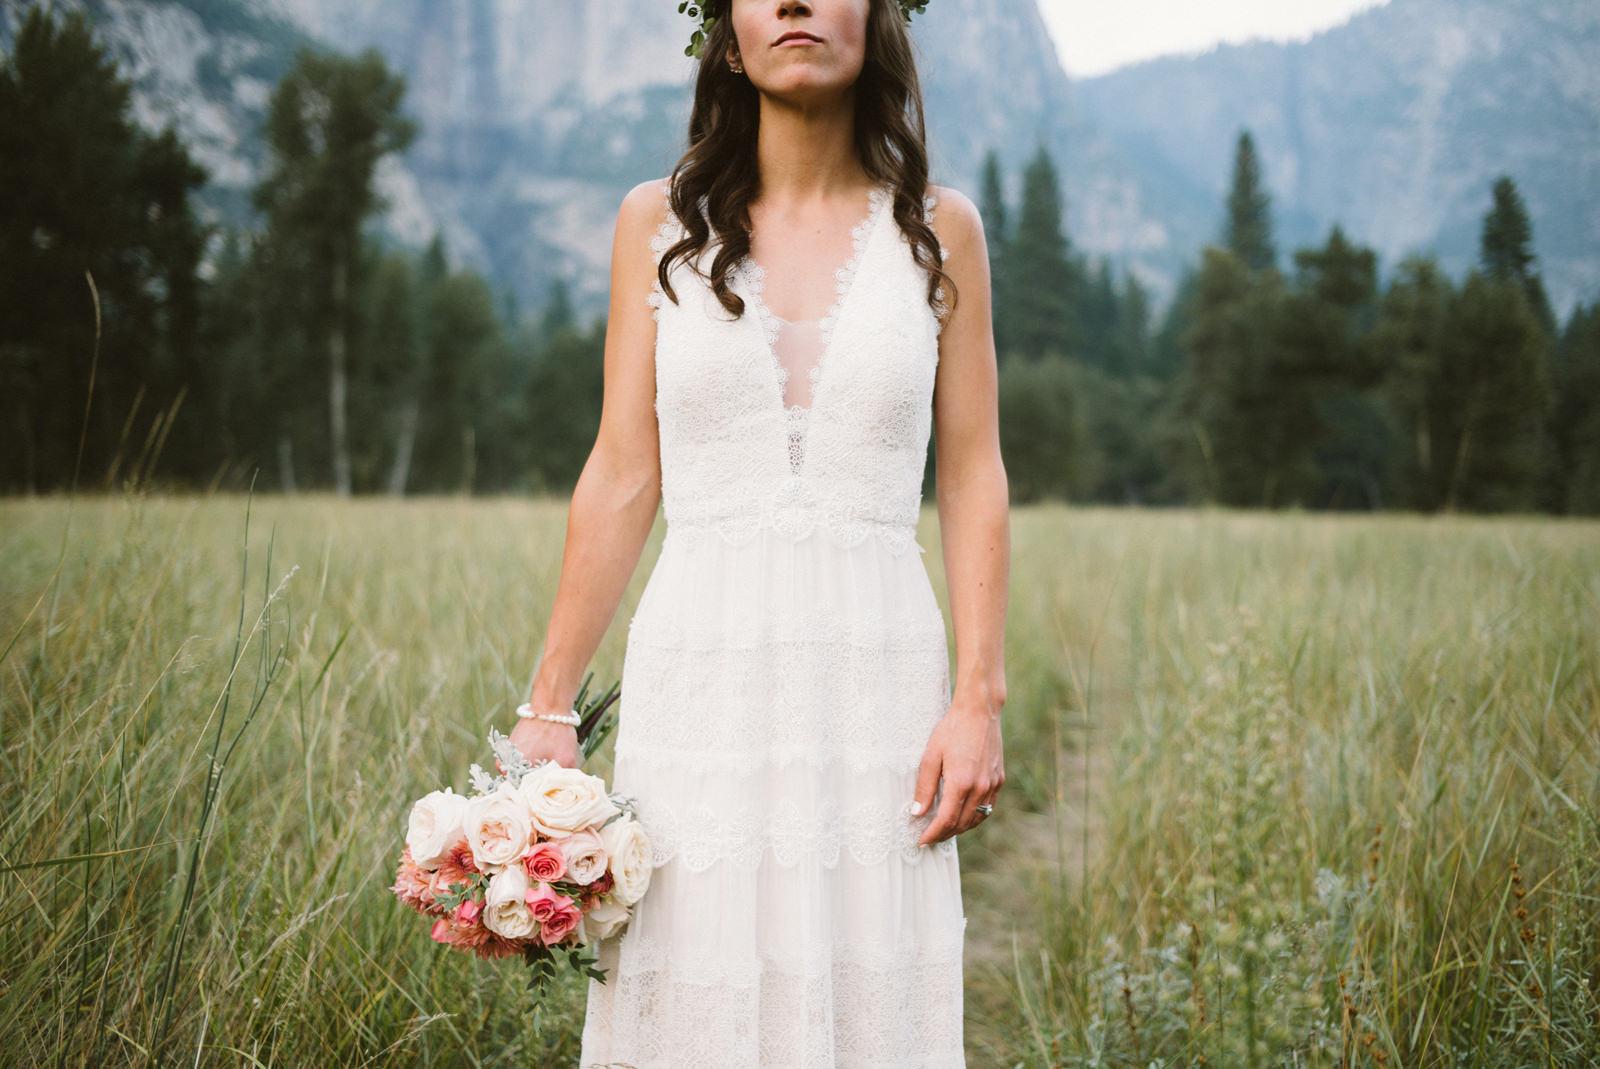 yosemite-intimate-wedding-093 YOSEMITE INTIMATE WEDDING